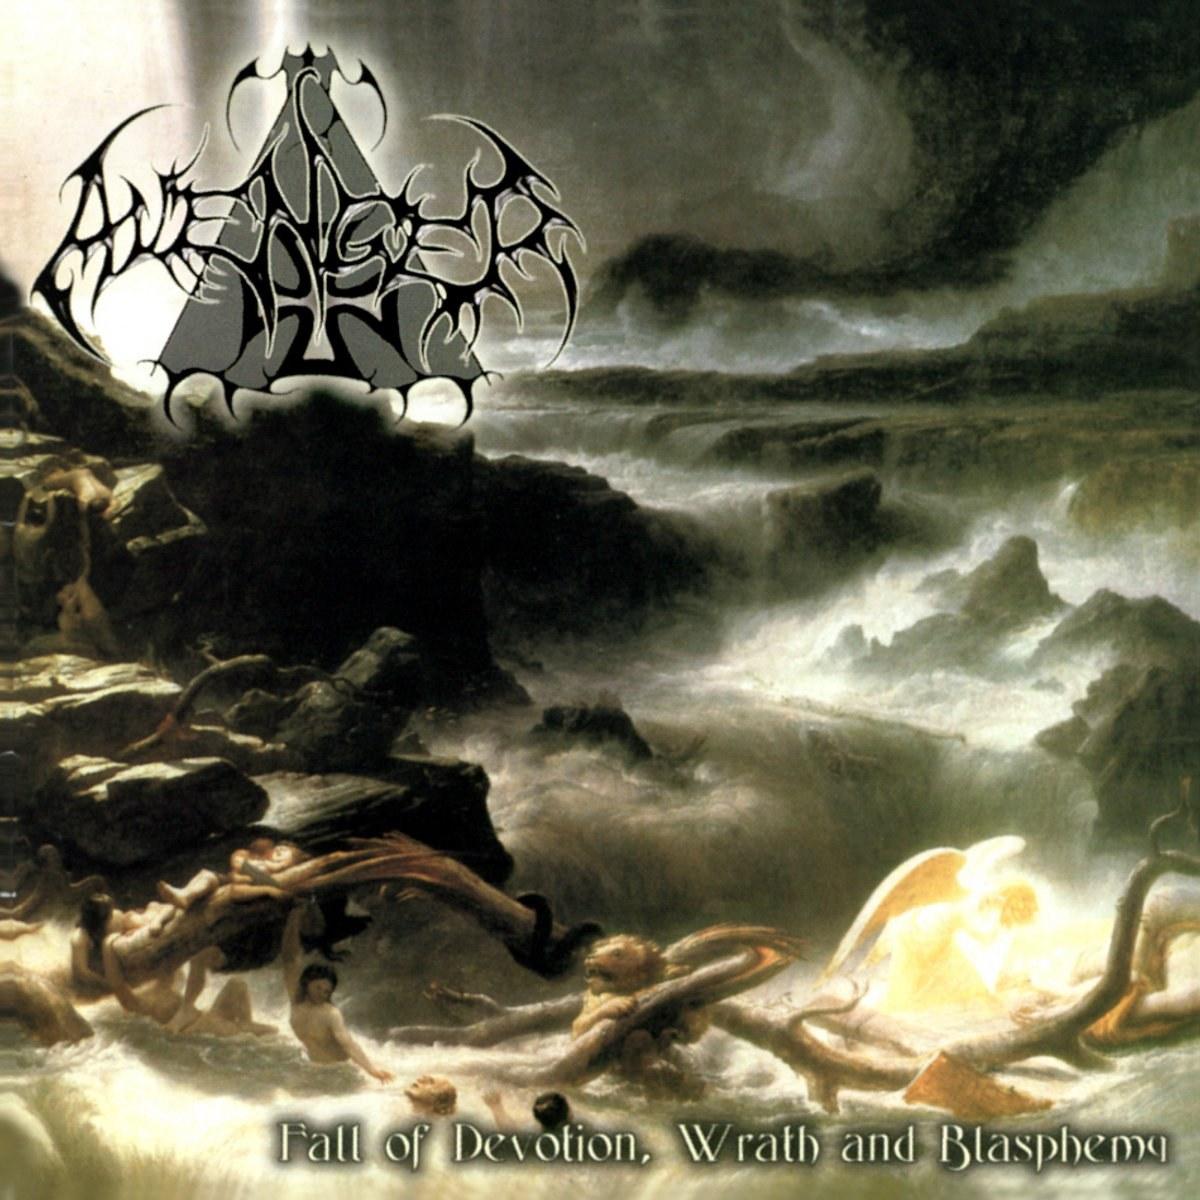 Avenger - Fall of Devotion, Wrath and Blasphemy